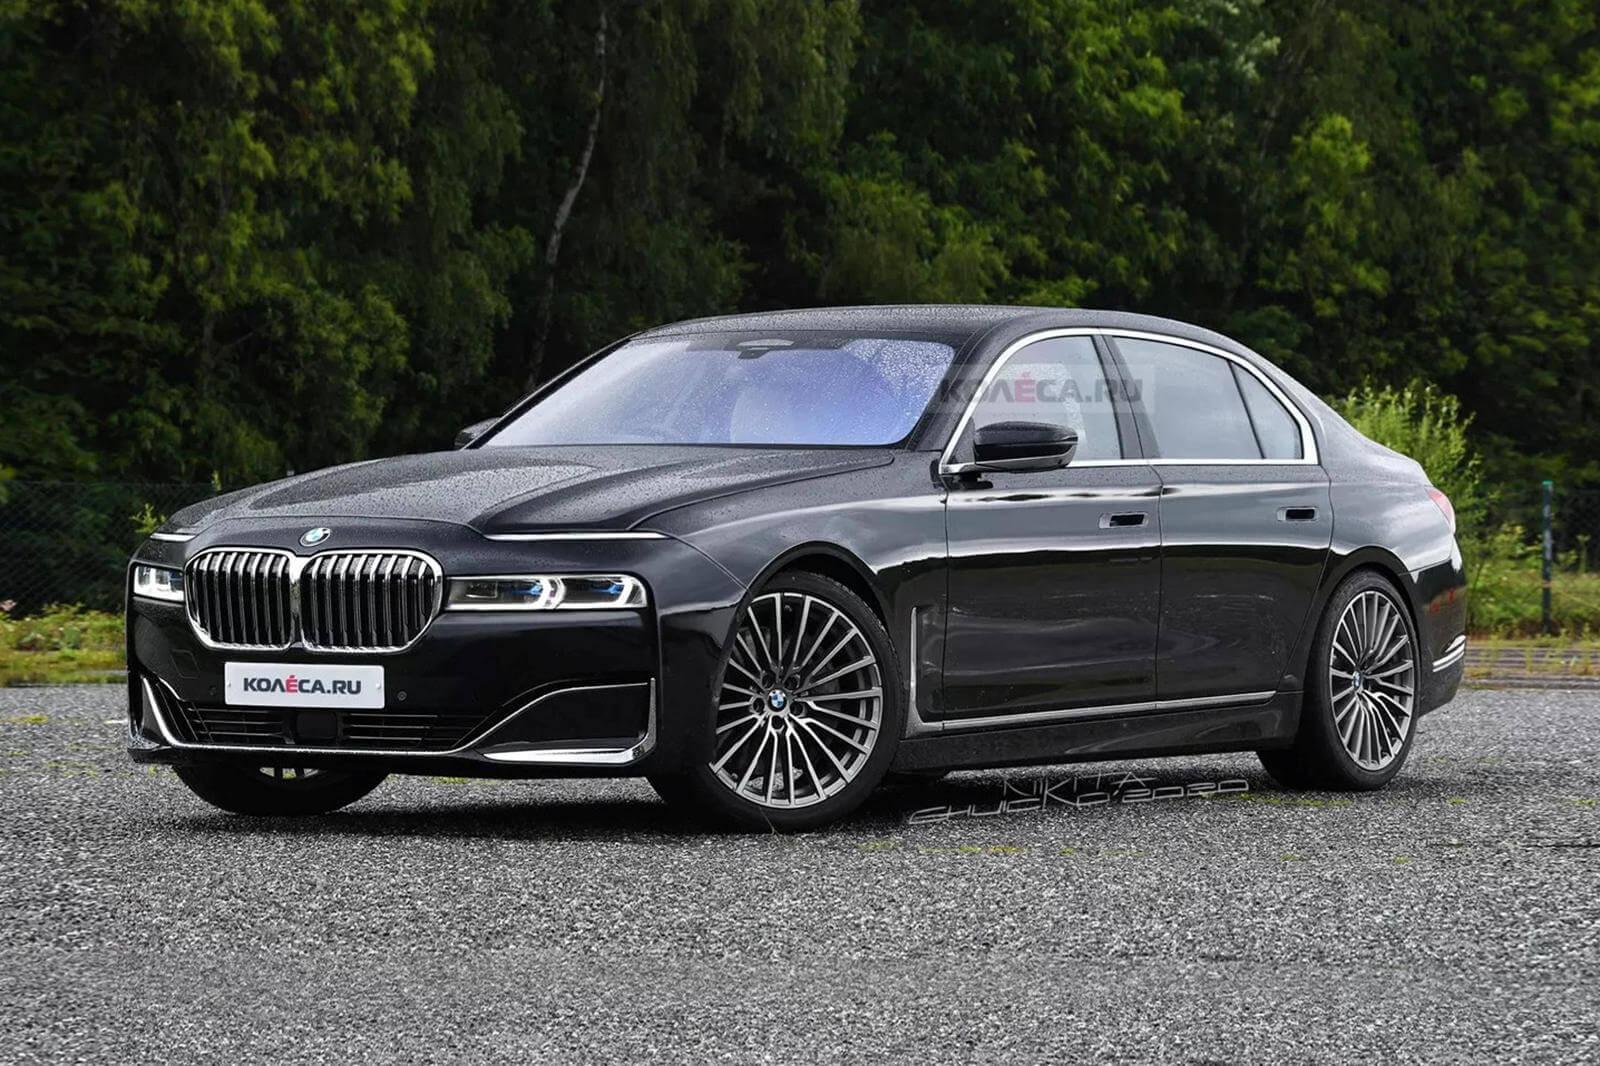 2021 Yeni BMW 7 Serisi